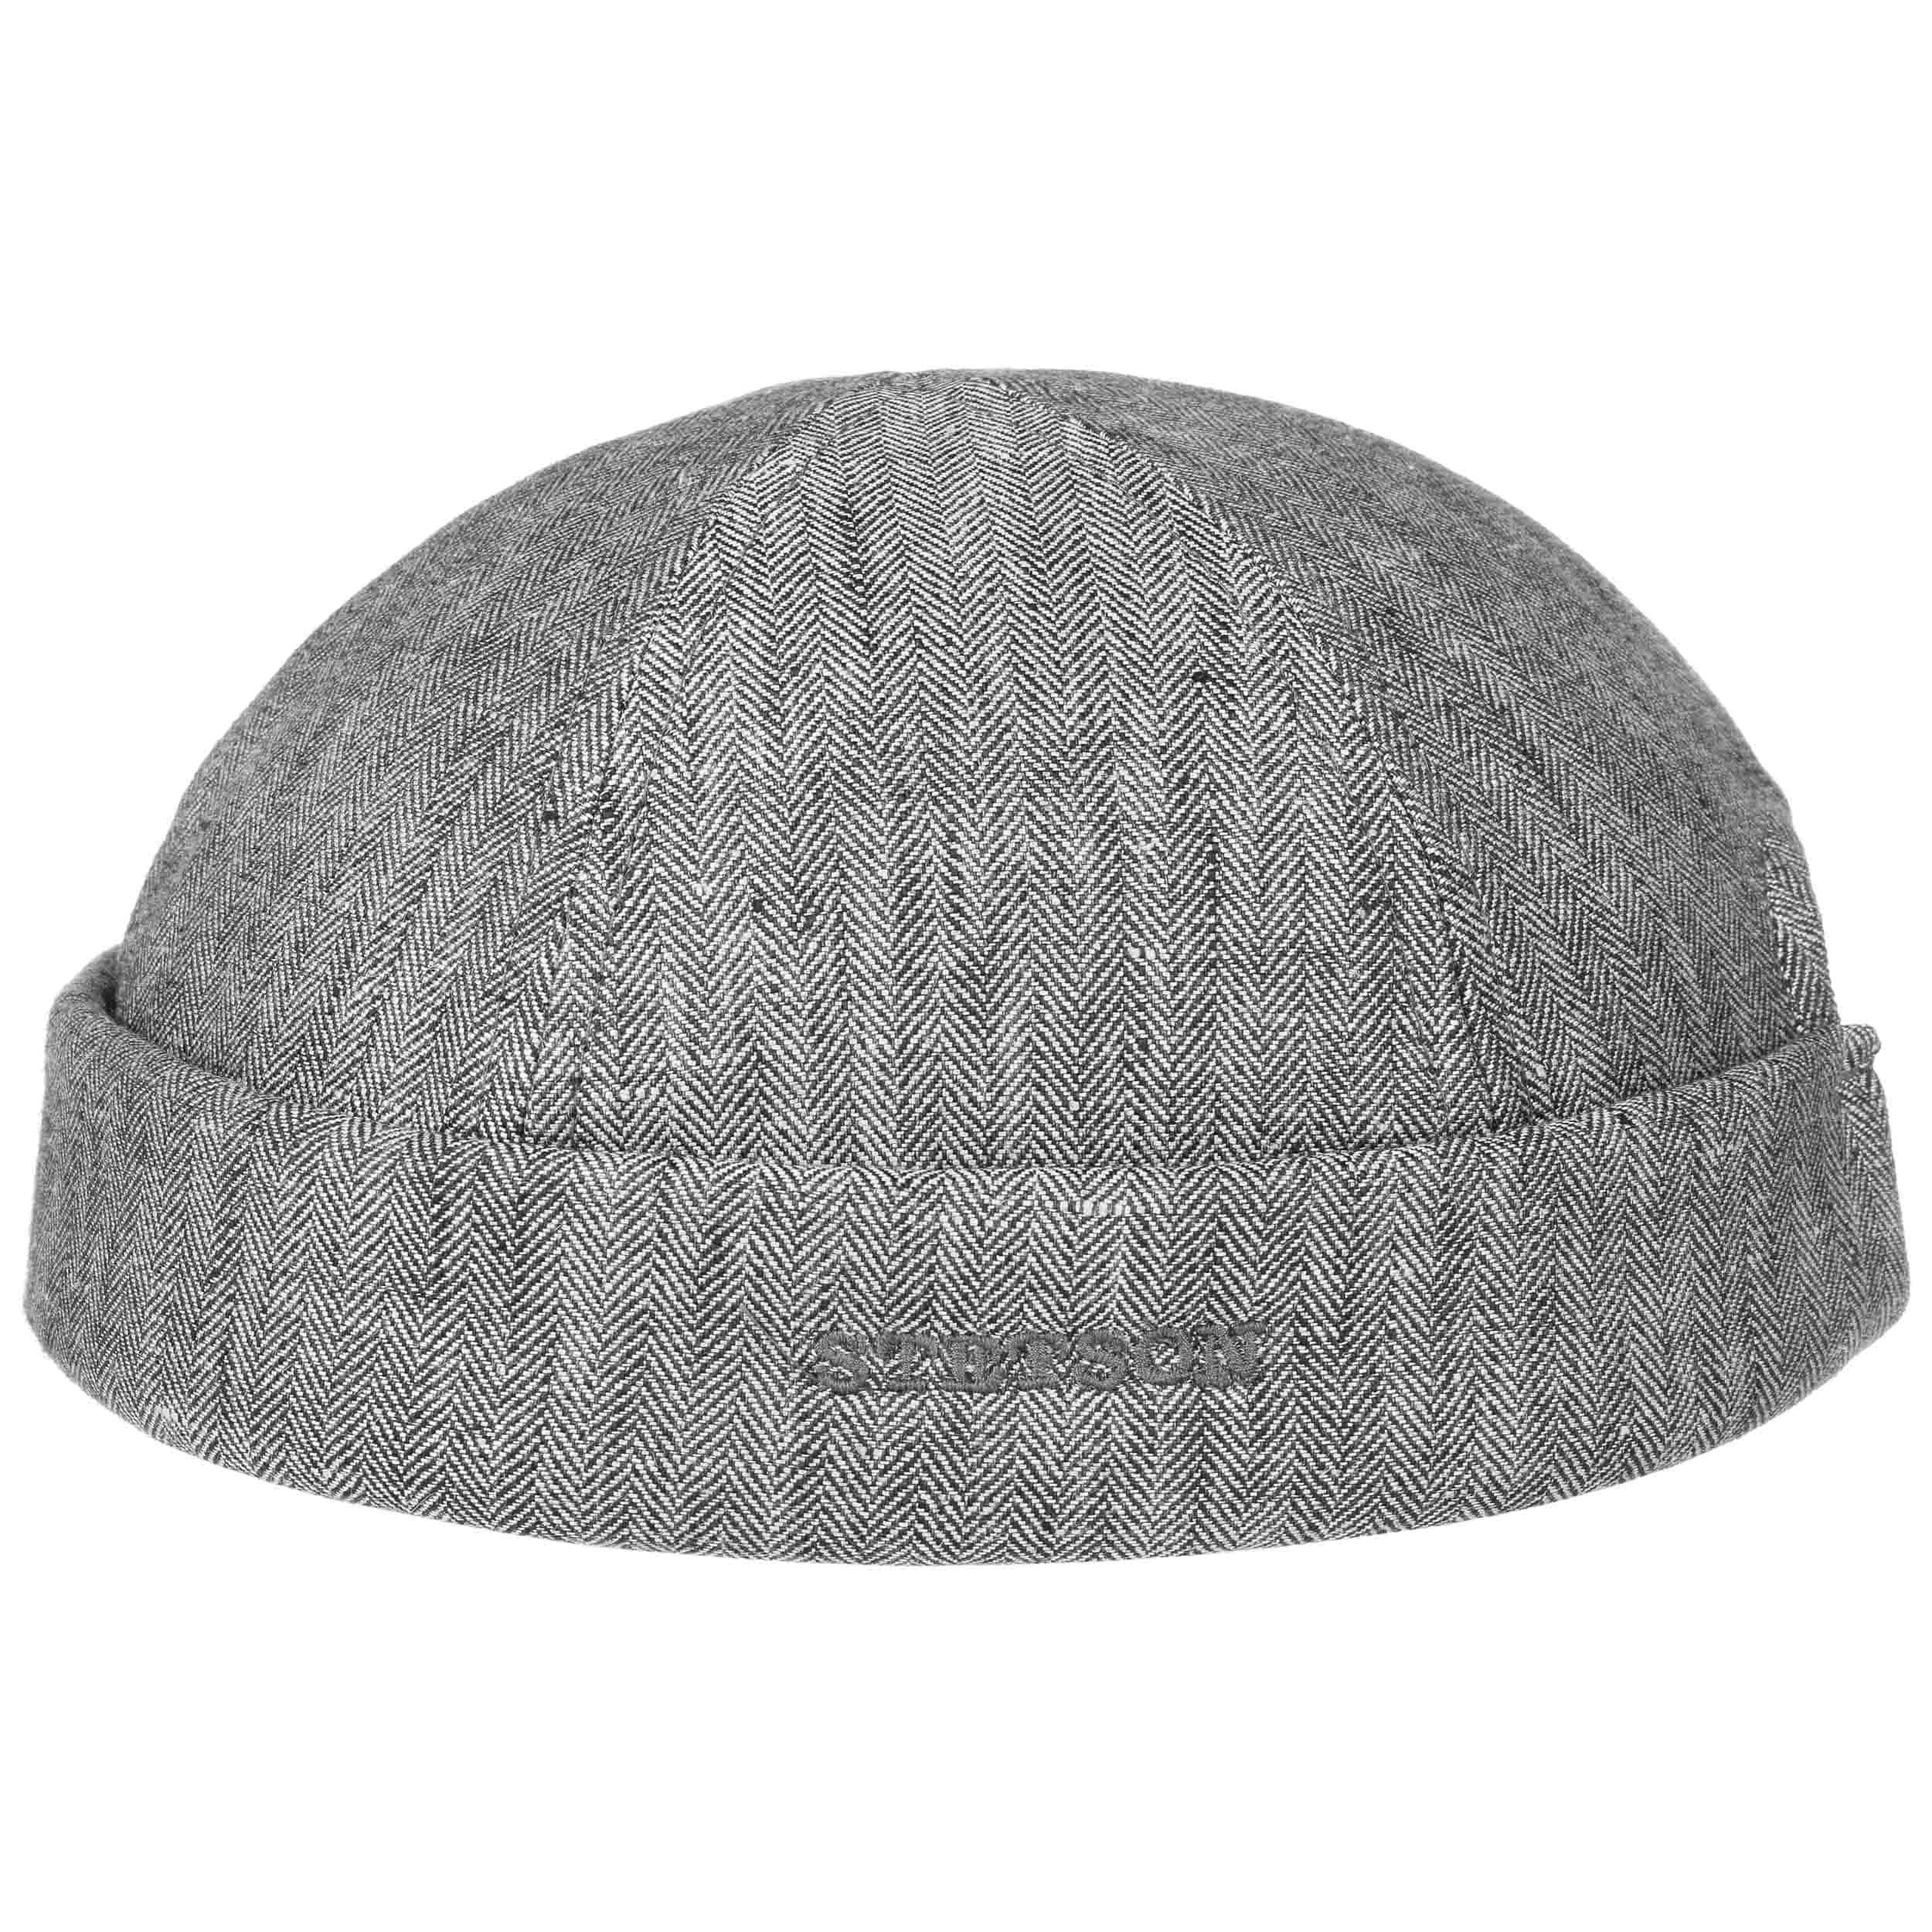 681120a41e1 ... Linen Docker Hat by Stetson - grey 6 ...